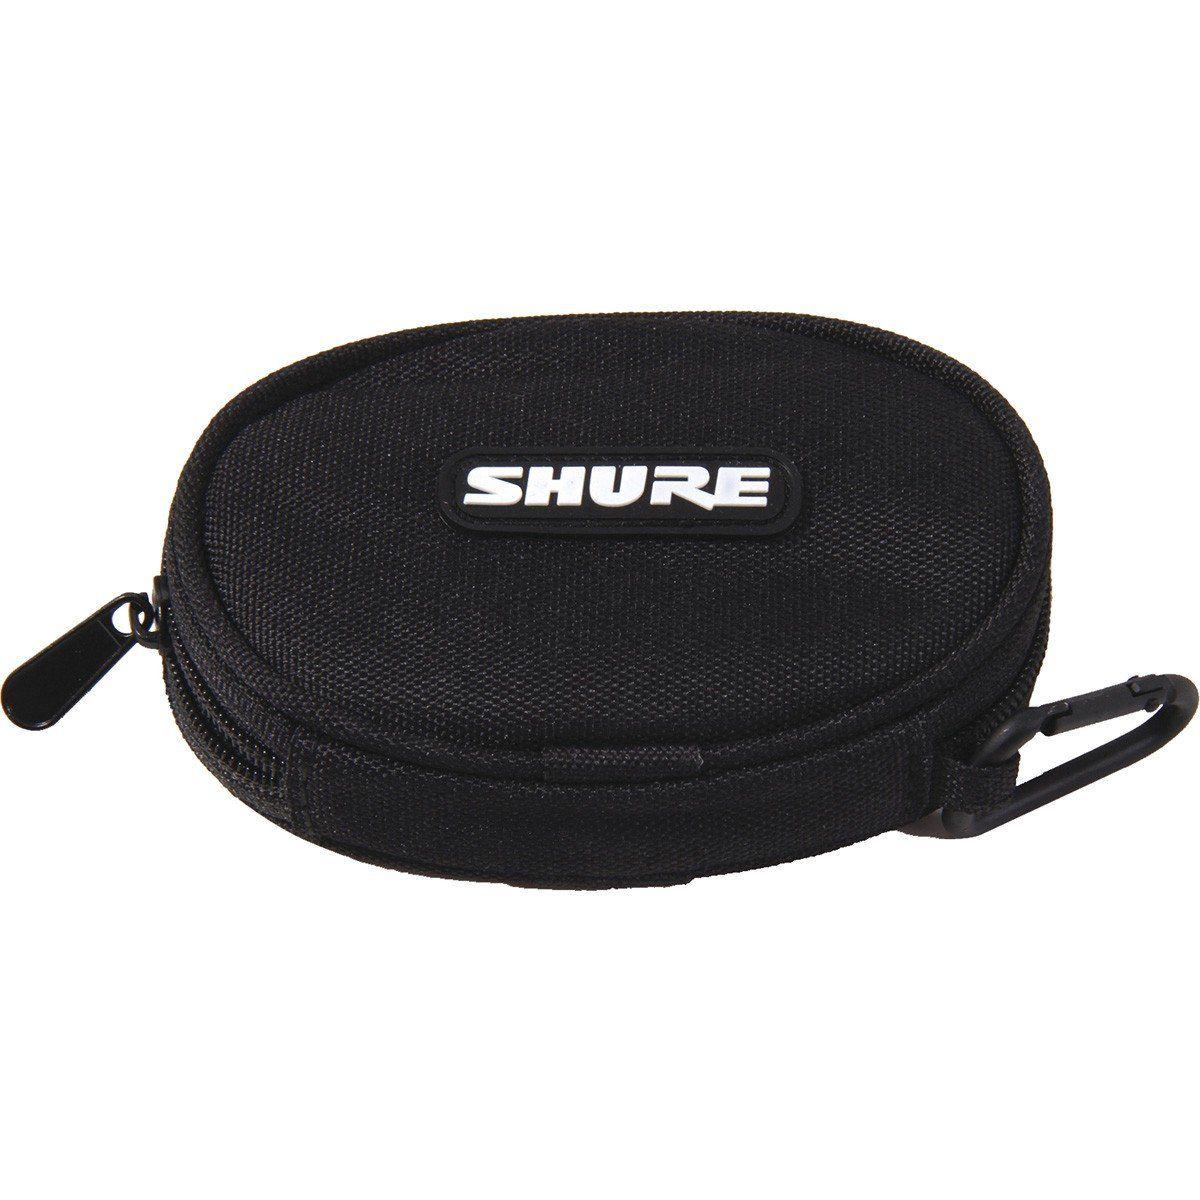 Shure SE 215 Fone de Ouvido SE215 Original In-Ear Isolamento Acústico